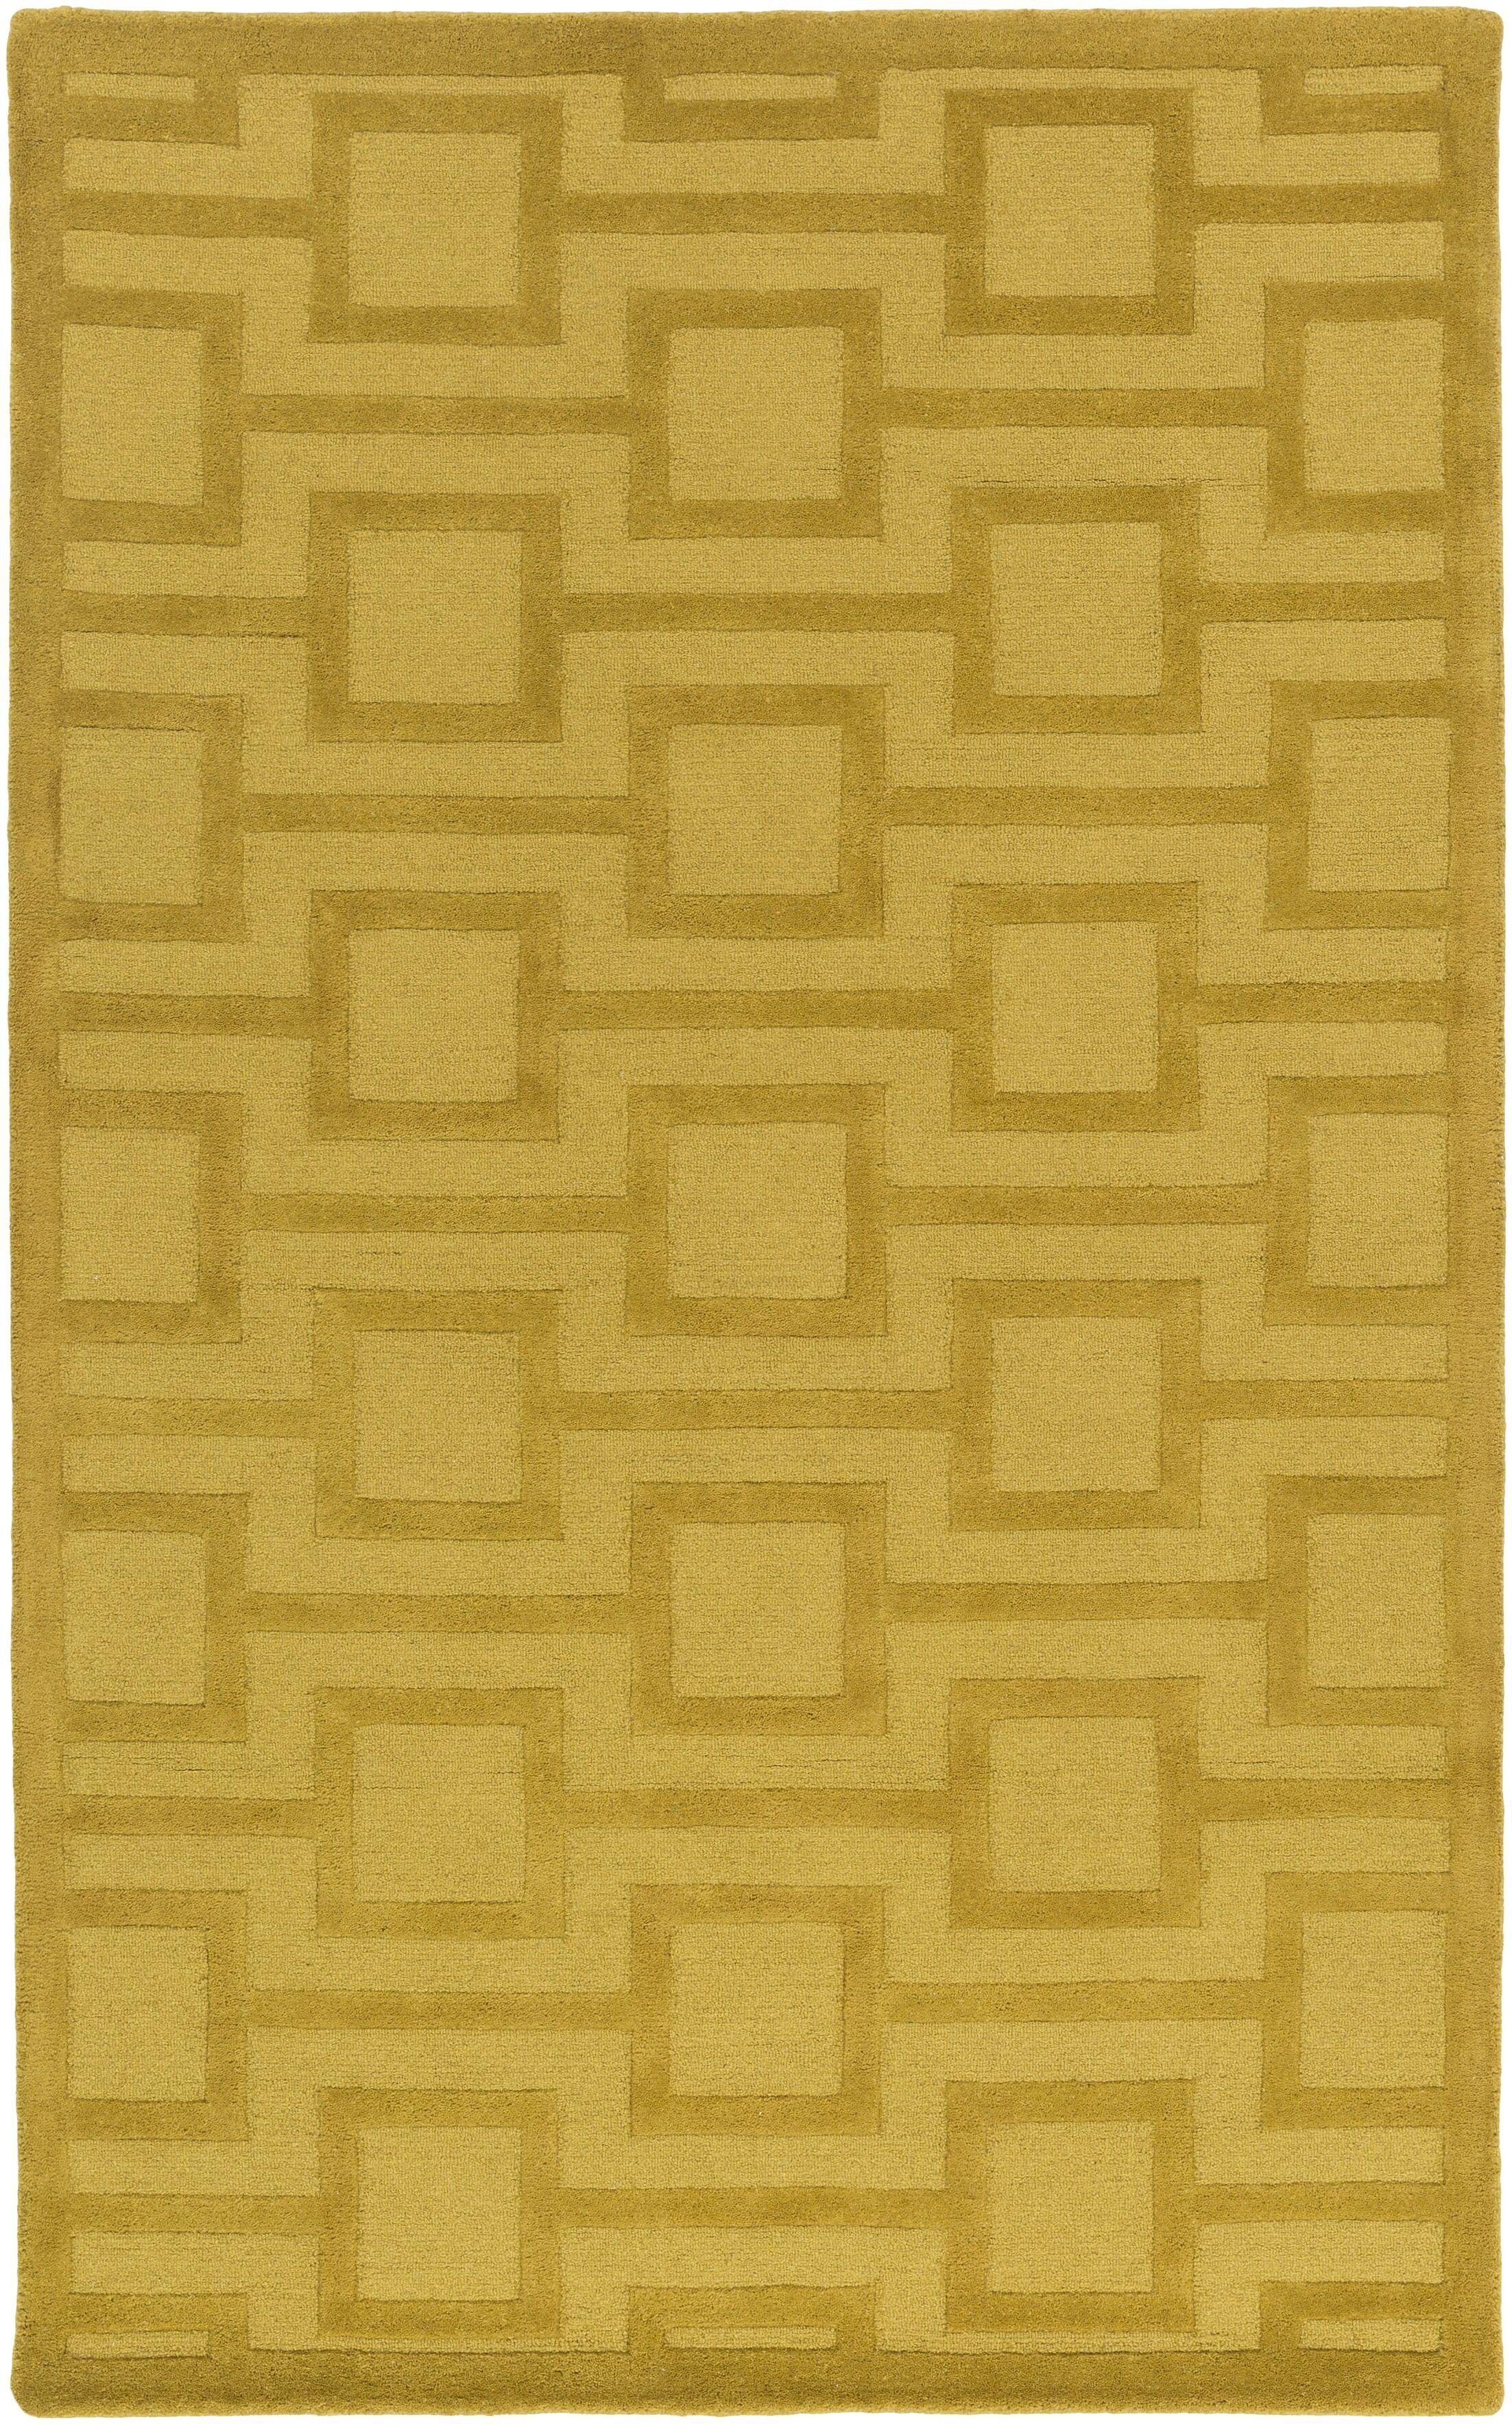 Sarai Hand-Tufted Gold Area Rug Rug Size: Rectangle 8' x 10'